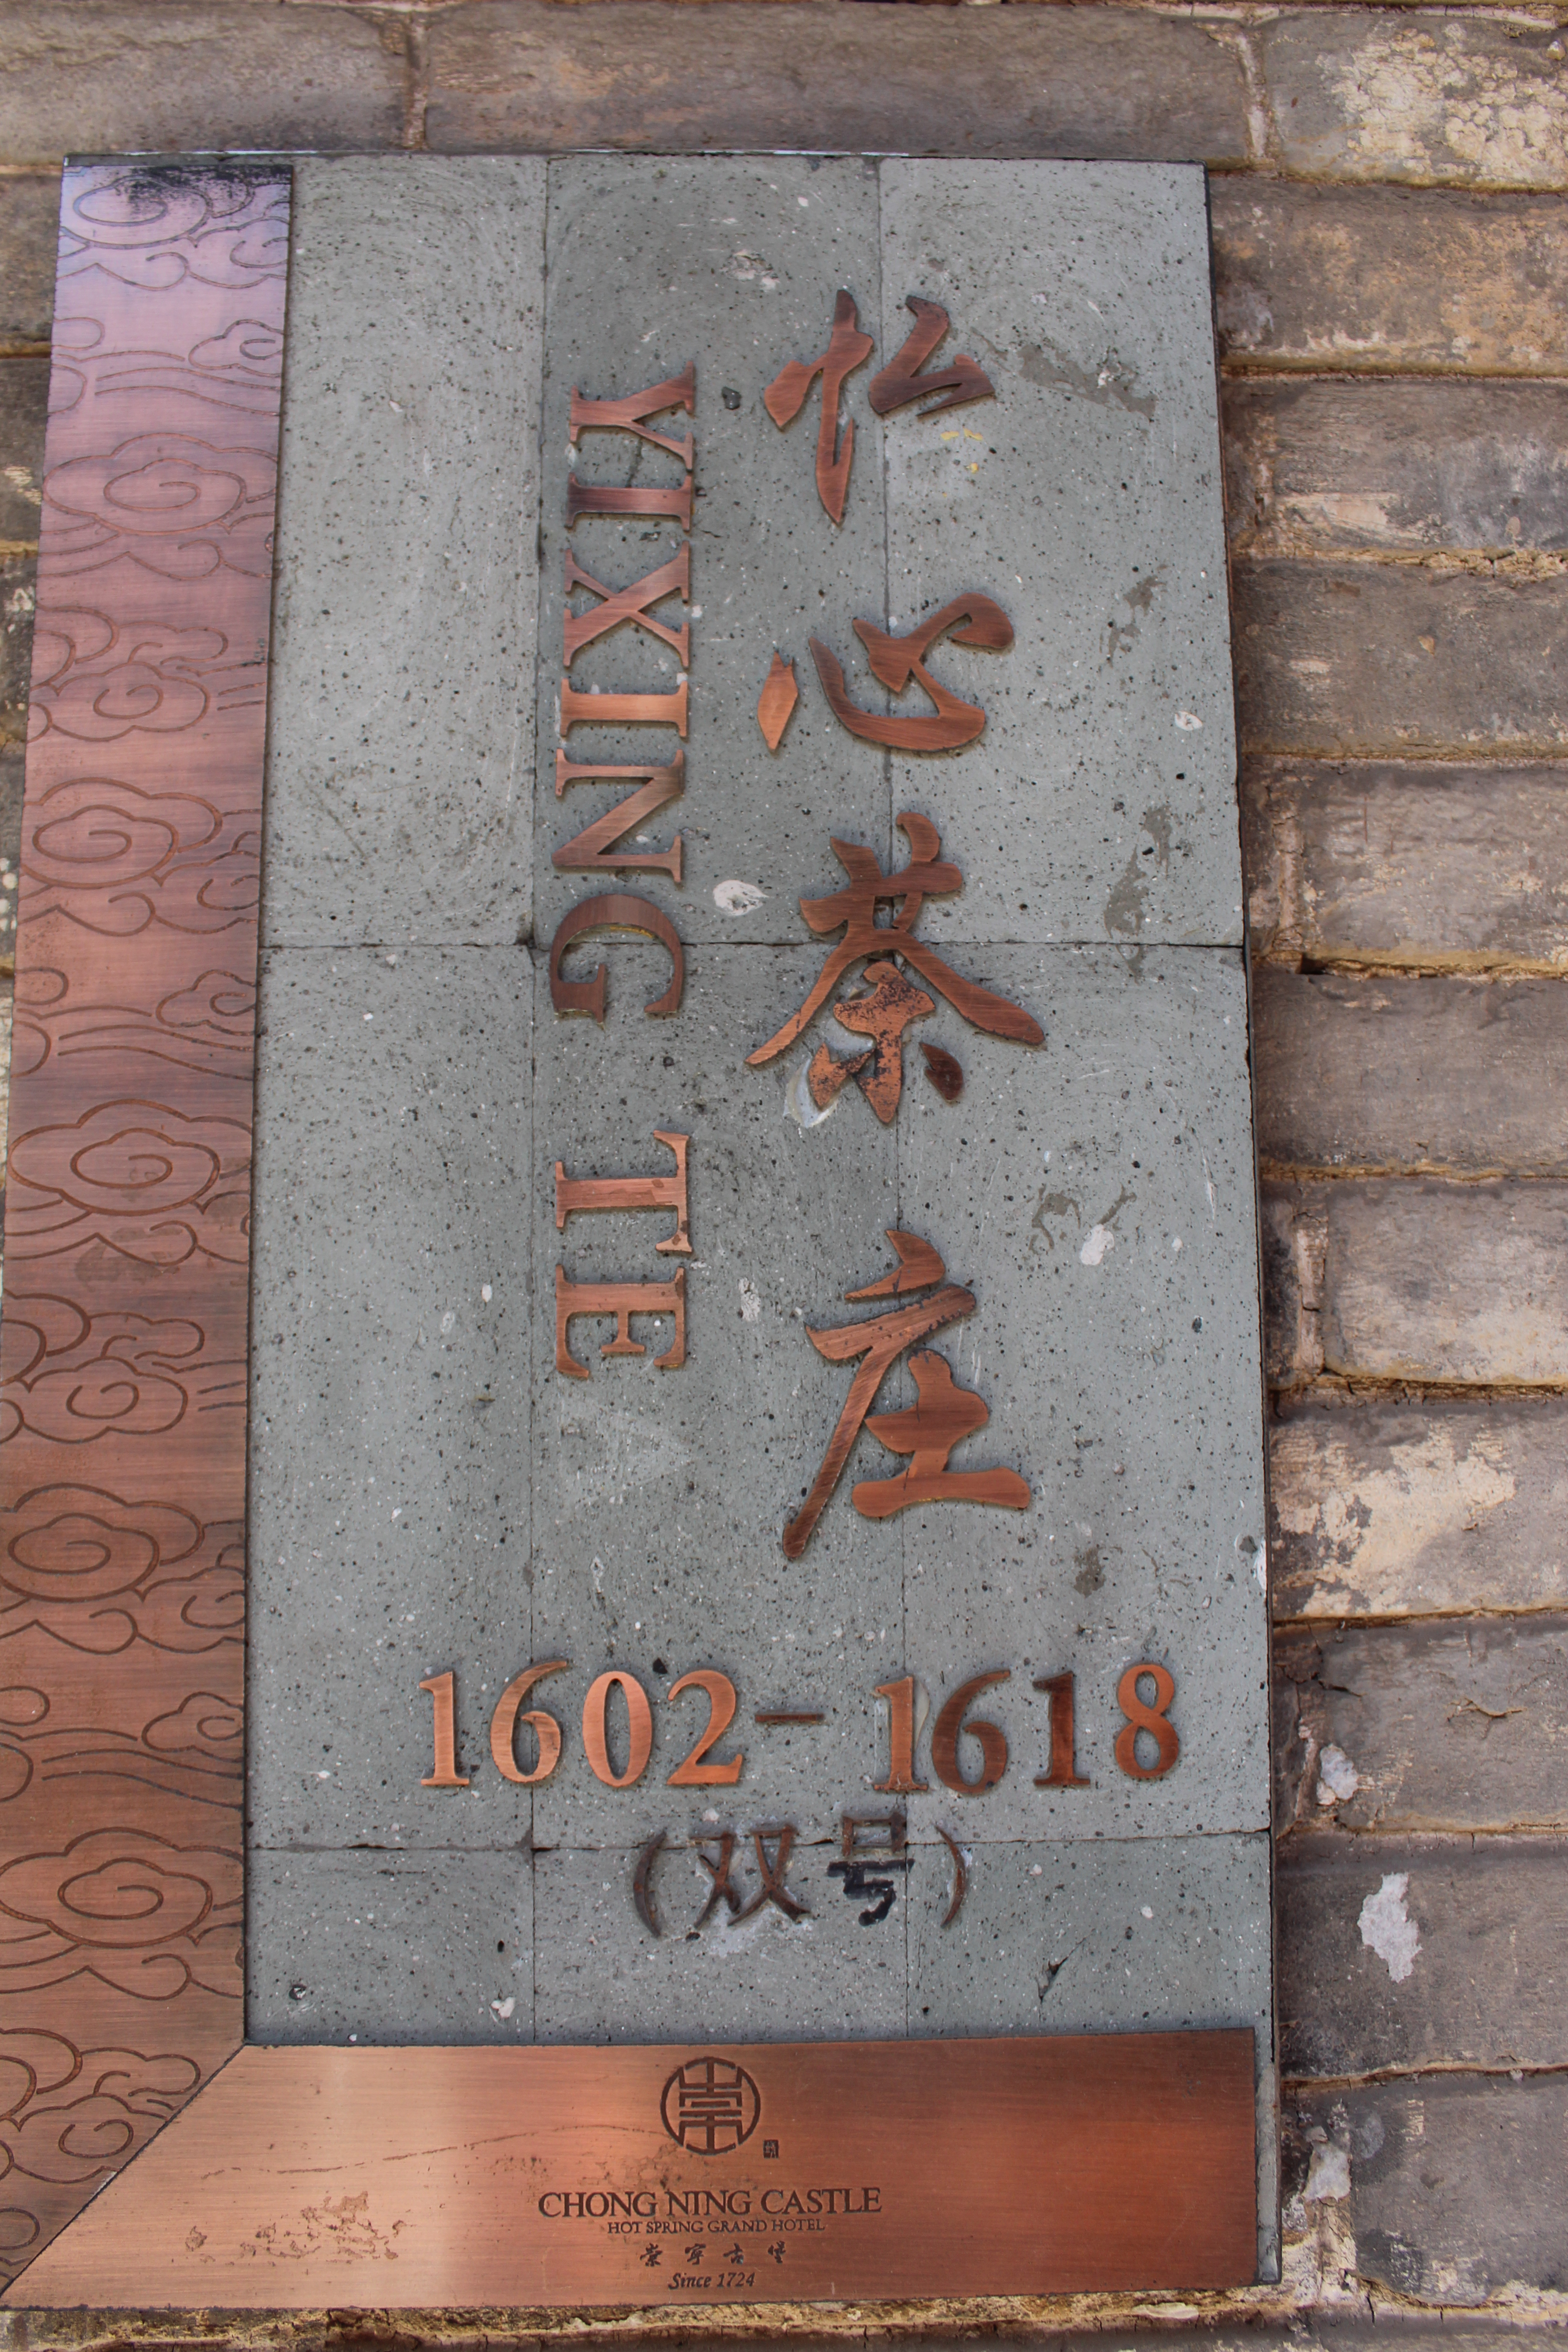 Chong Ning Castle Hotel